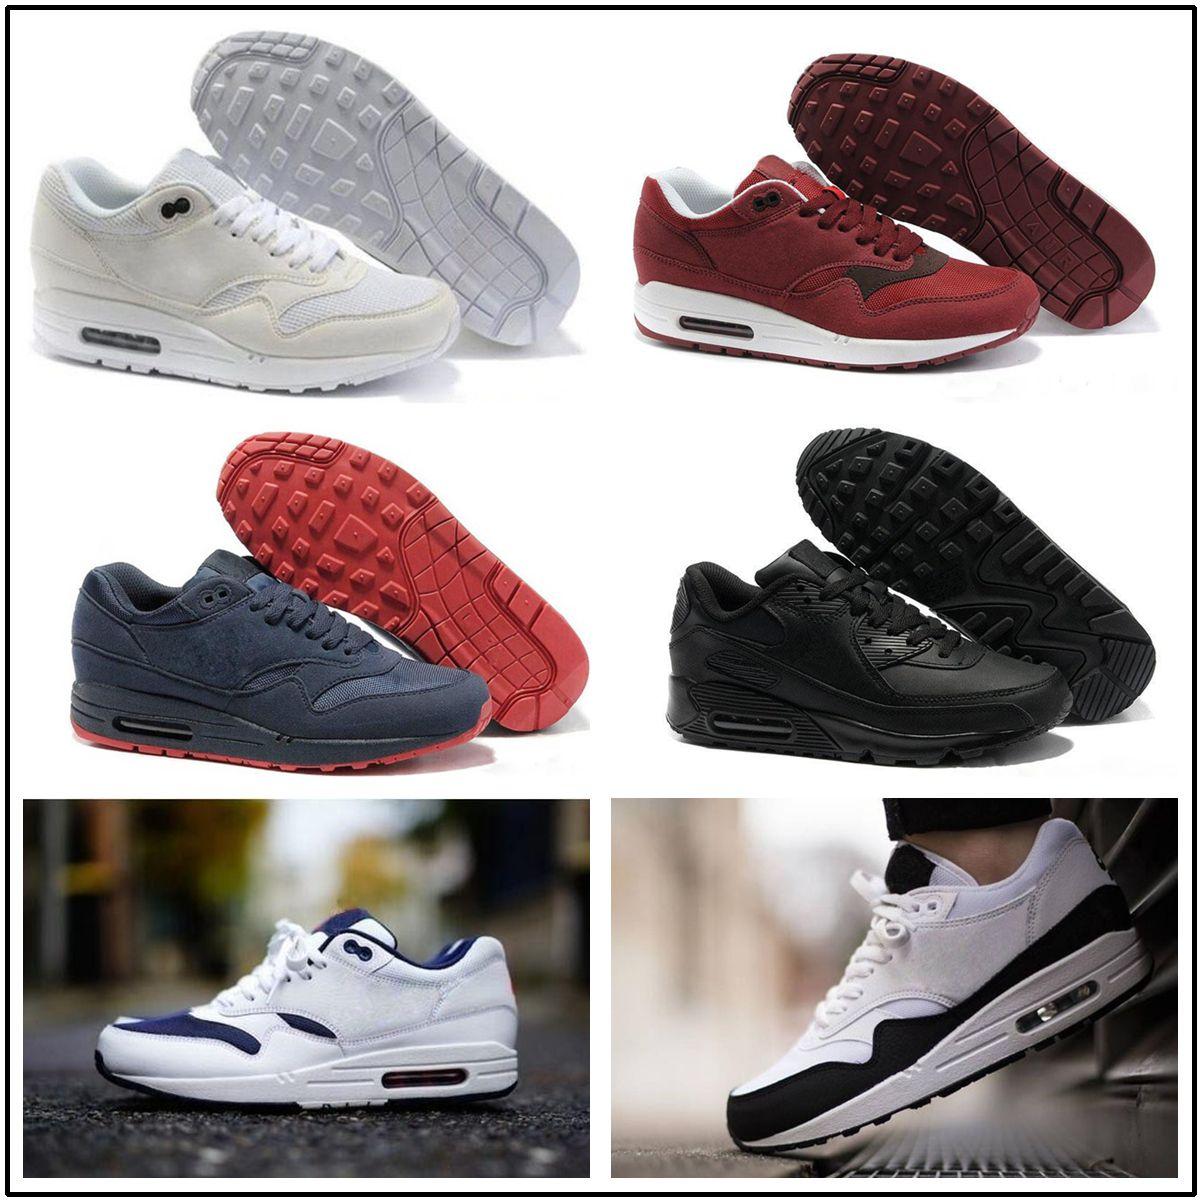 promo code 80508 bb945 Compre 2018 Nike Air Max 1 87 90 AirMax Nuevo Envío Gratuito Famous 87 90  Ultra 1 Elephant Black Clear Jade White Para Mujer Para Hombre Zapatillas  De ...